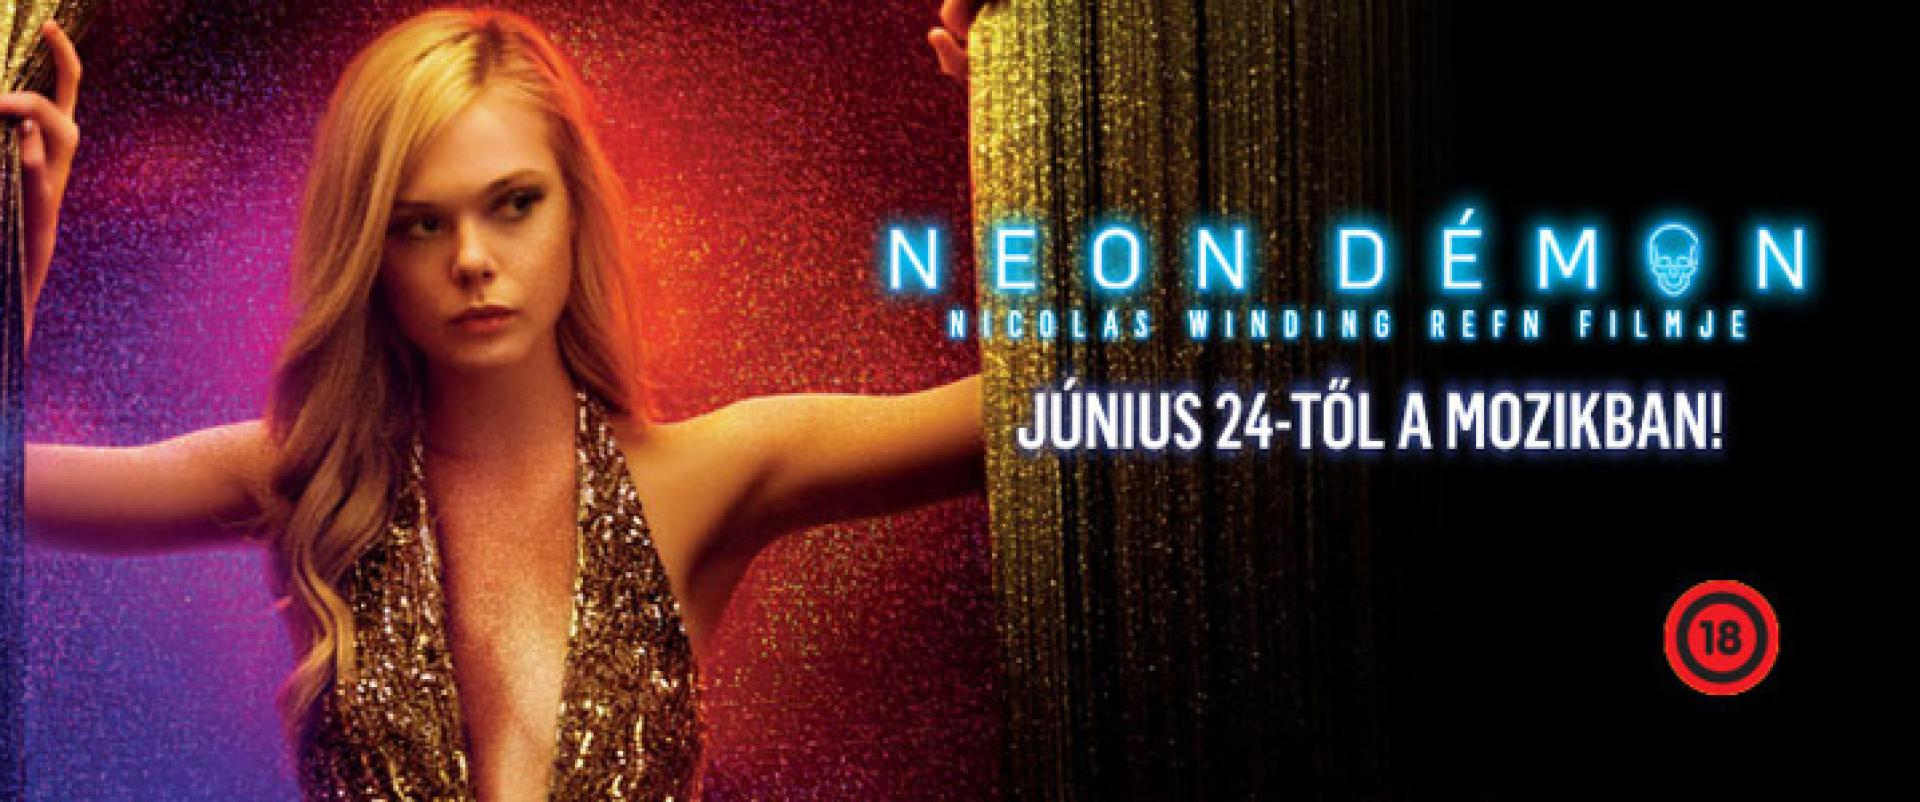 Neon démon (2016)